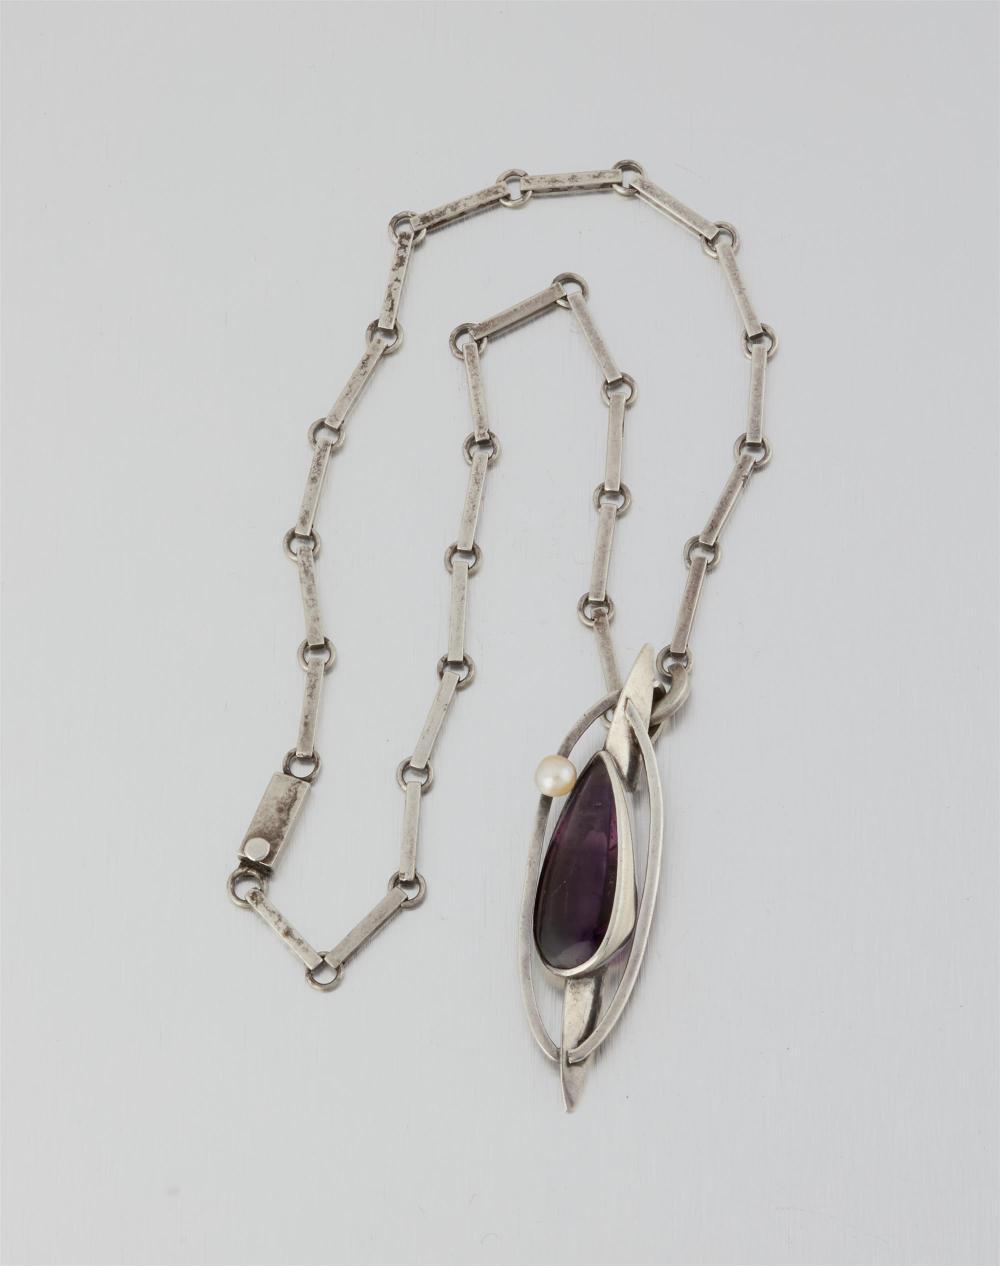 An Antonio Pineda silver, amethyst and pearl necklace